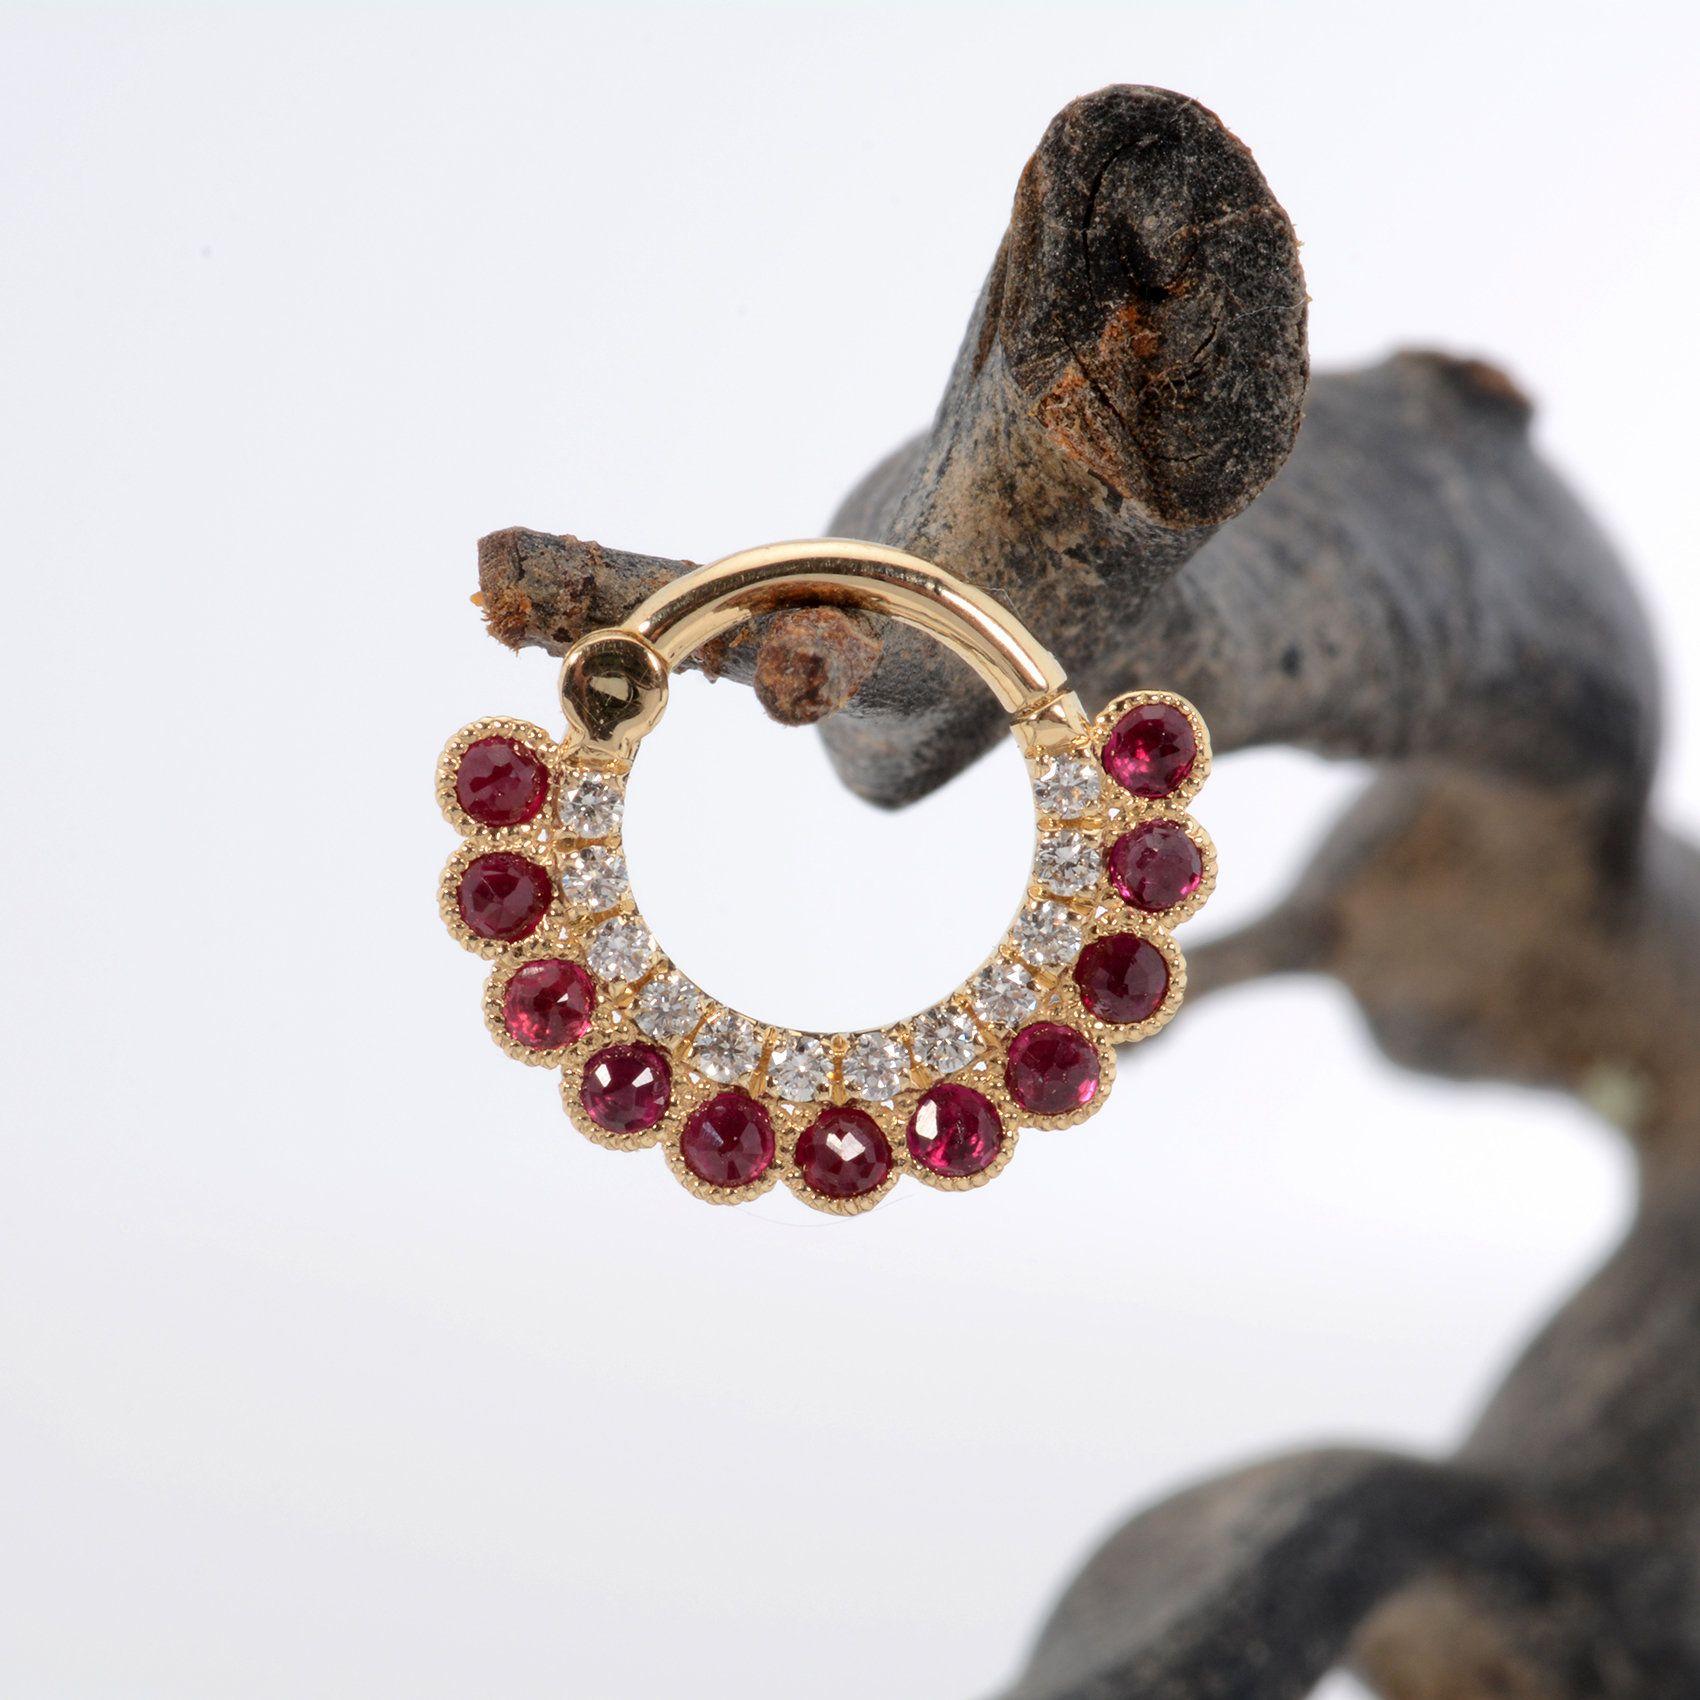 3866e49565ec2 14k Solid Gold Septum Сlicker White Diamonds Ruby Stone 16G - Helix ...